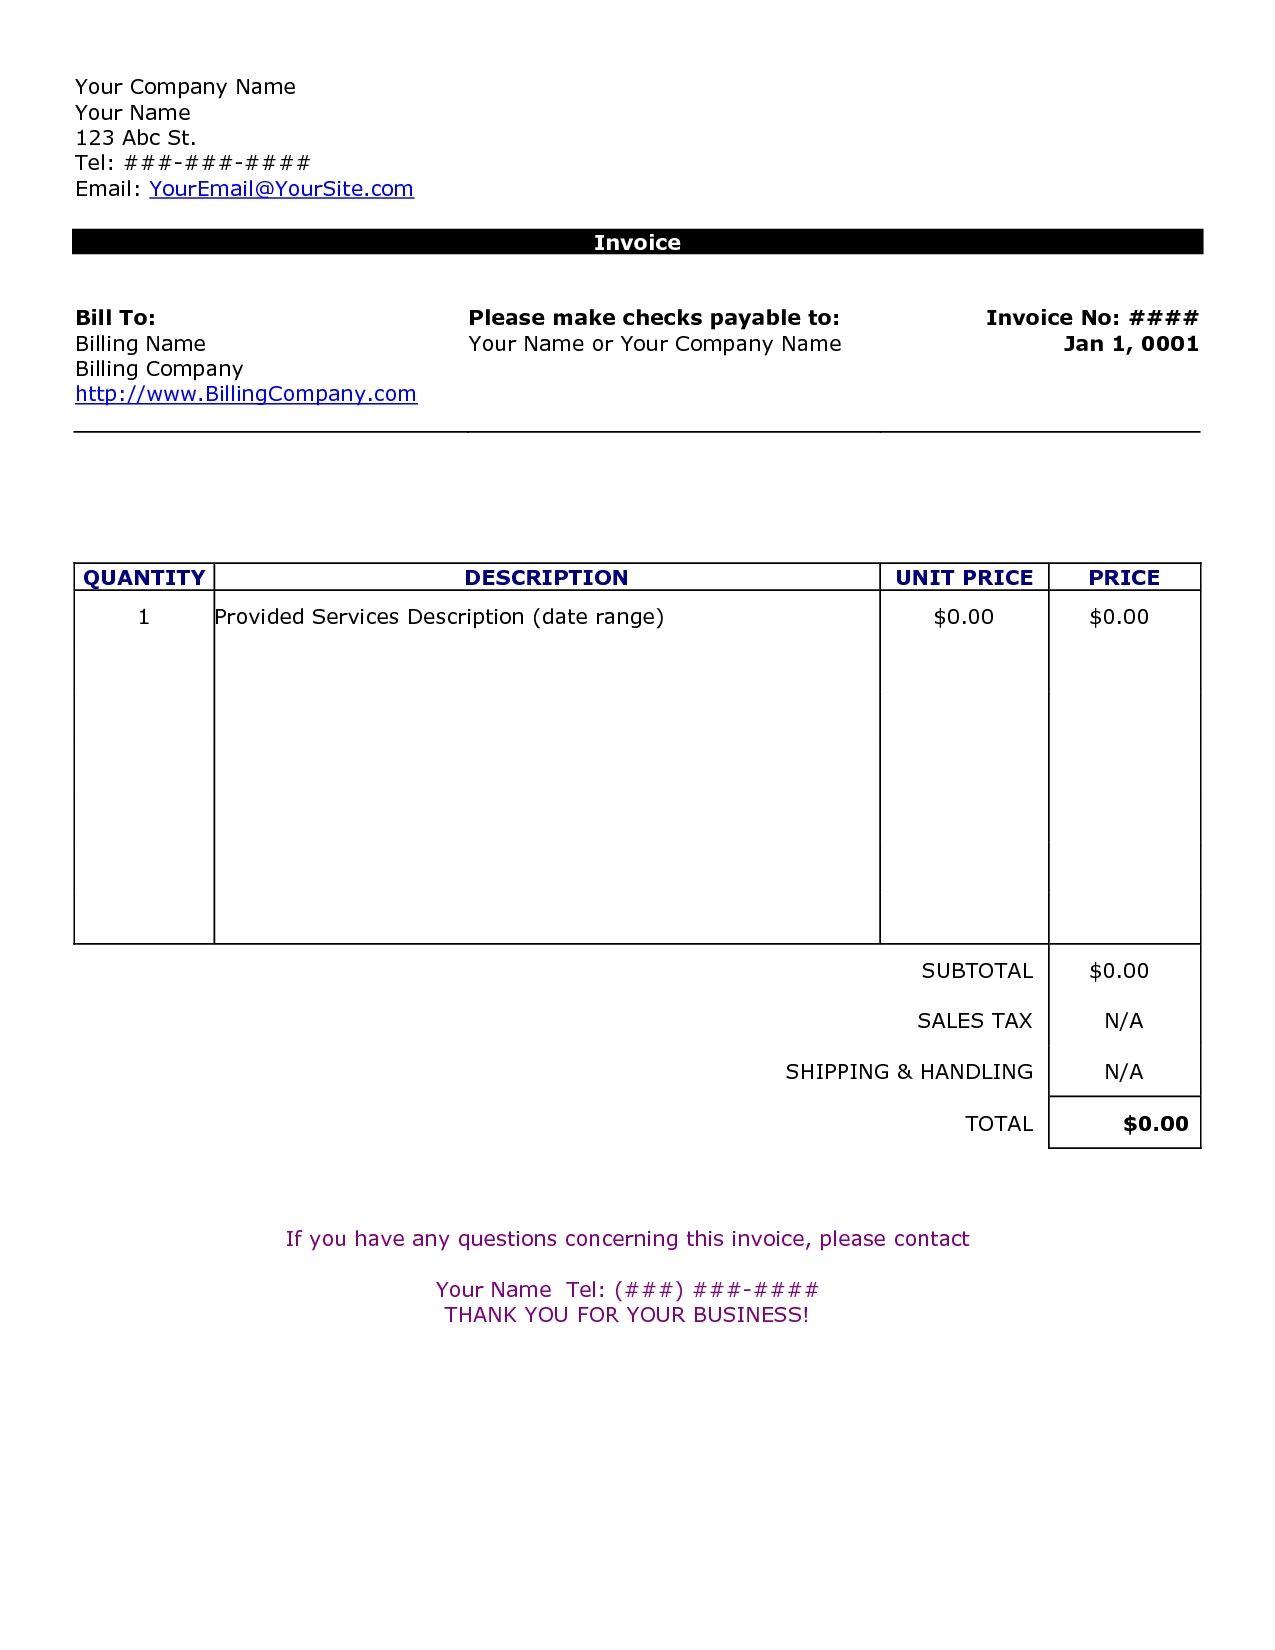 Custom Invoice Format Customizable Form Templates Customs